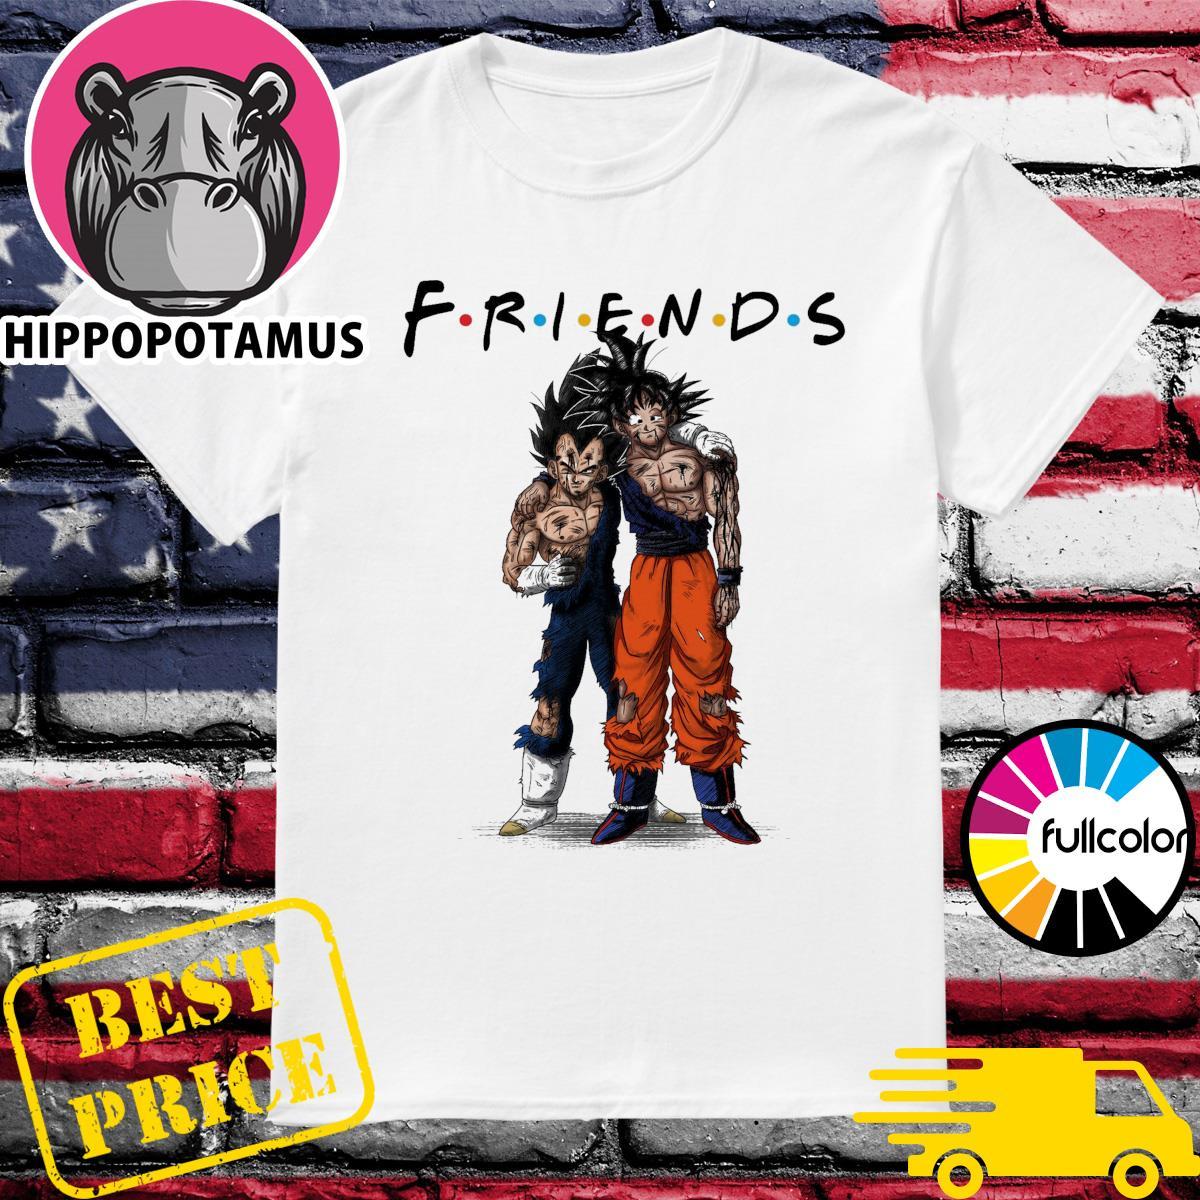 Friends Vegeta and Songoku stan by stan shirt